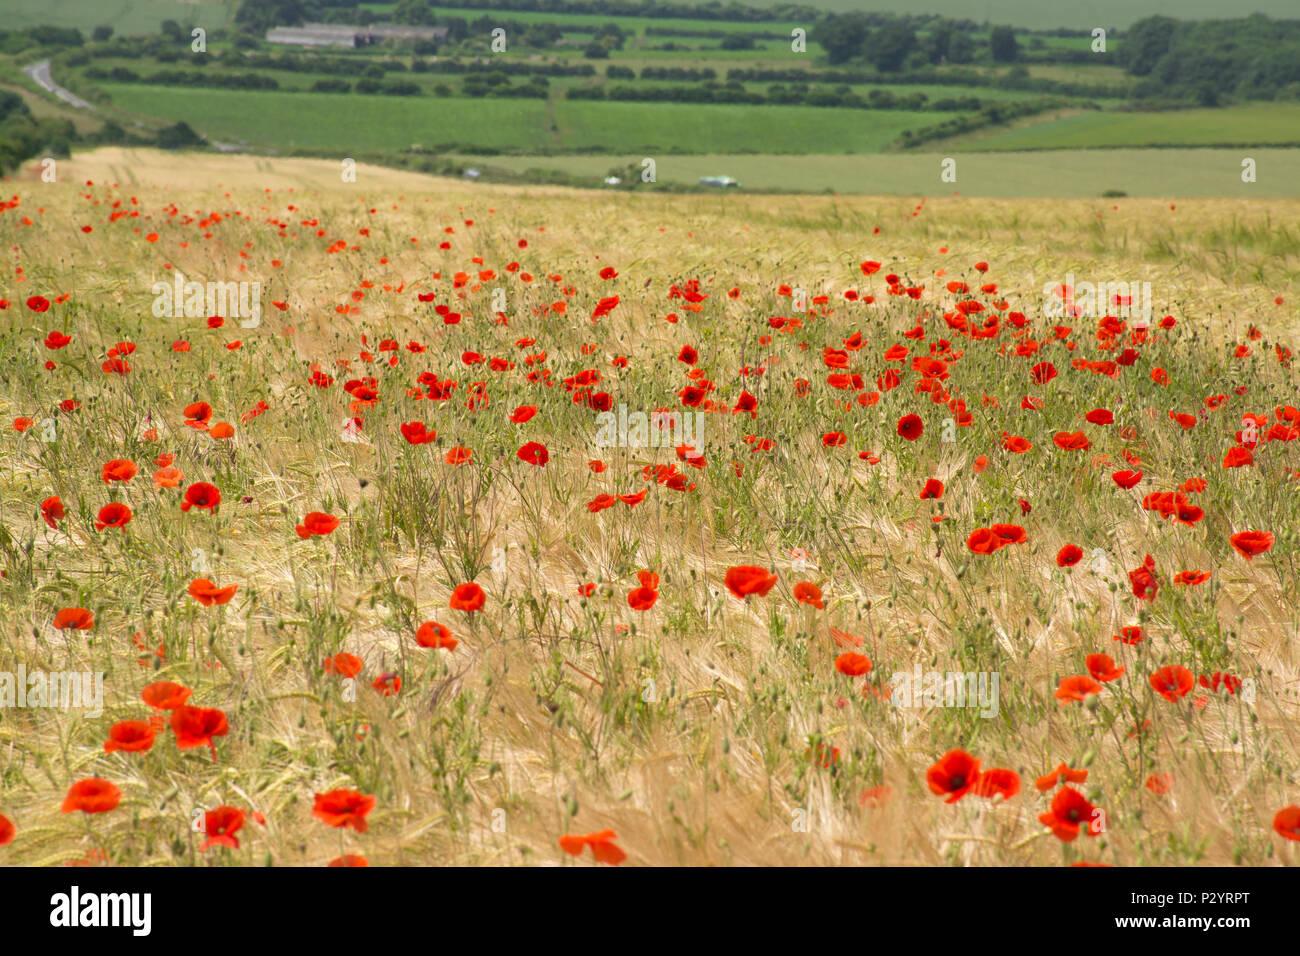 field-of-red-poppies-papaver-rhoeas-dorset-countryside-during-summer-uk-P2YRPT.jpg